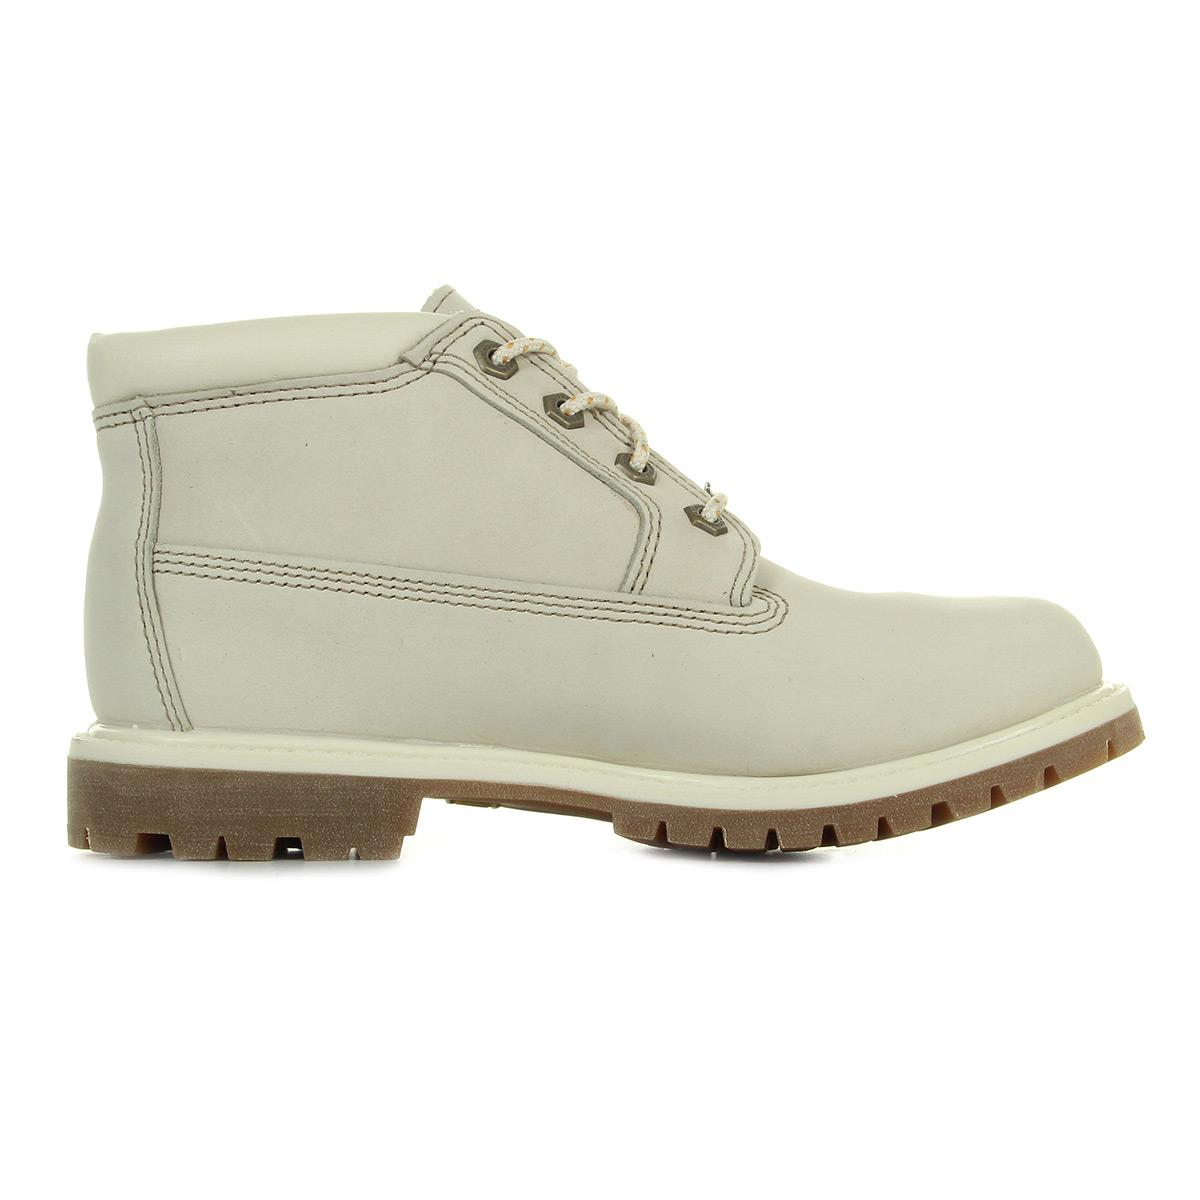 Timberland Boots Chukka Double Waterproof Boost Winter White Nubuck Combien En Ligne ABPX03